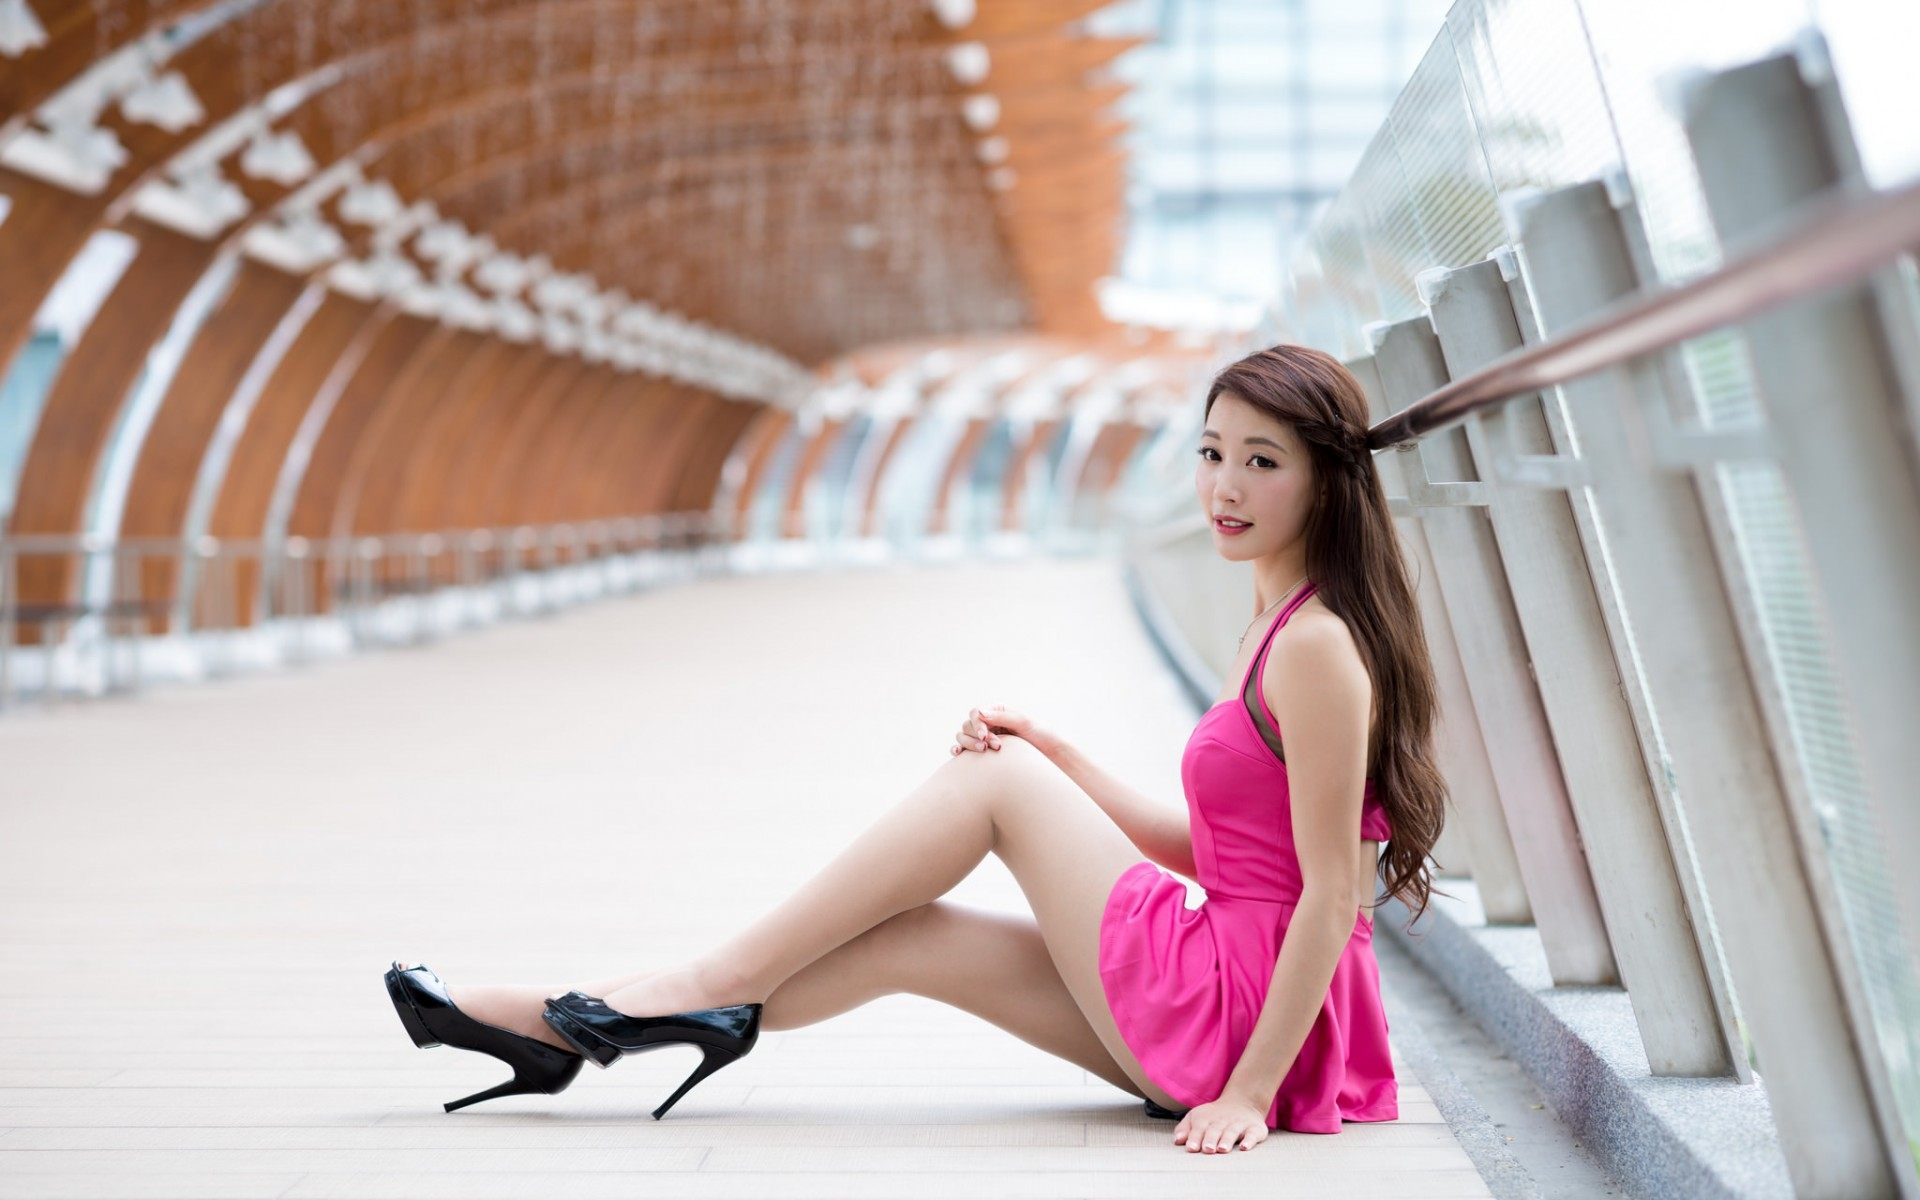 Asian face girl